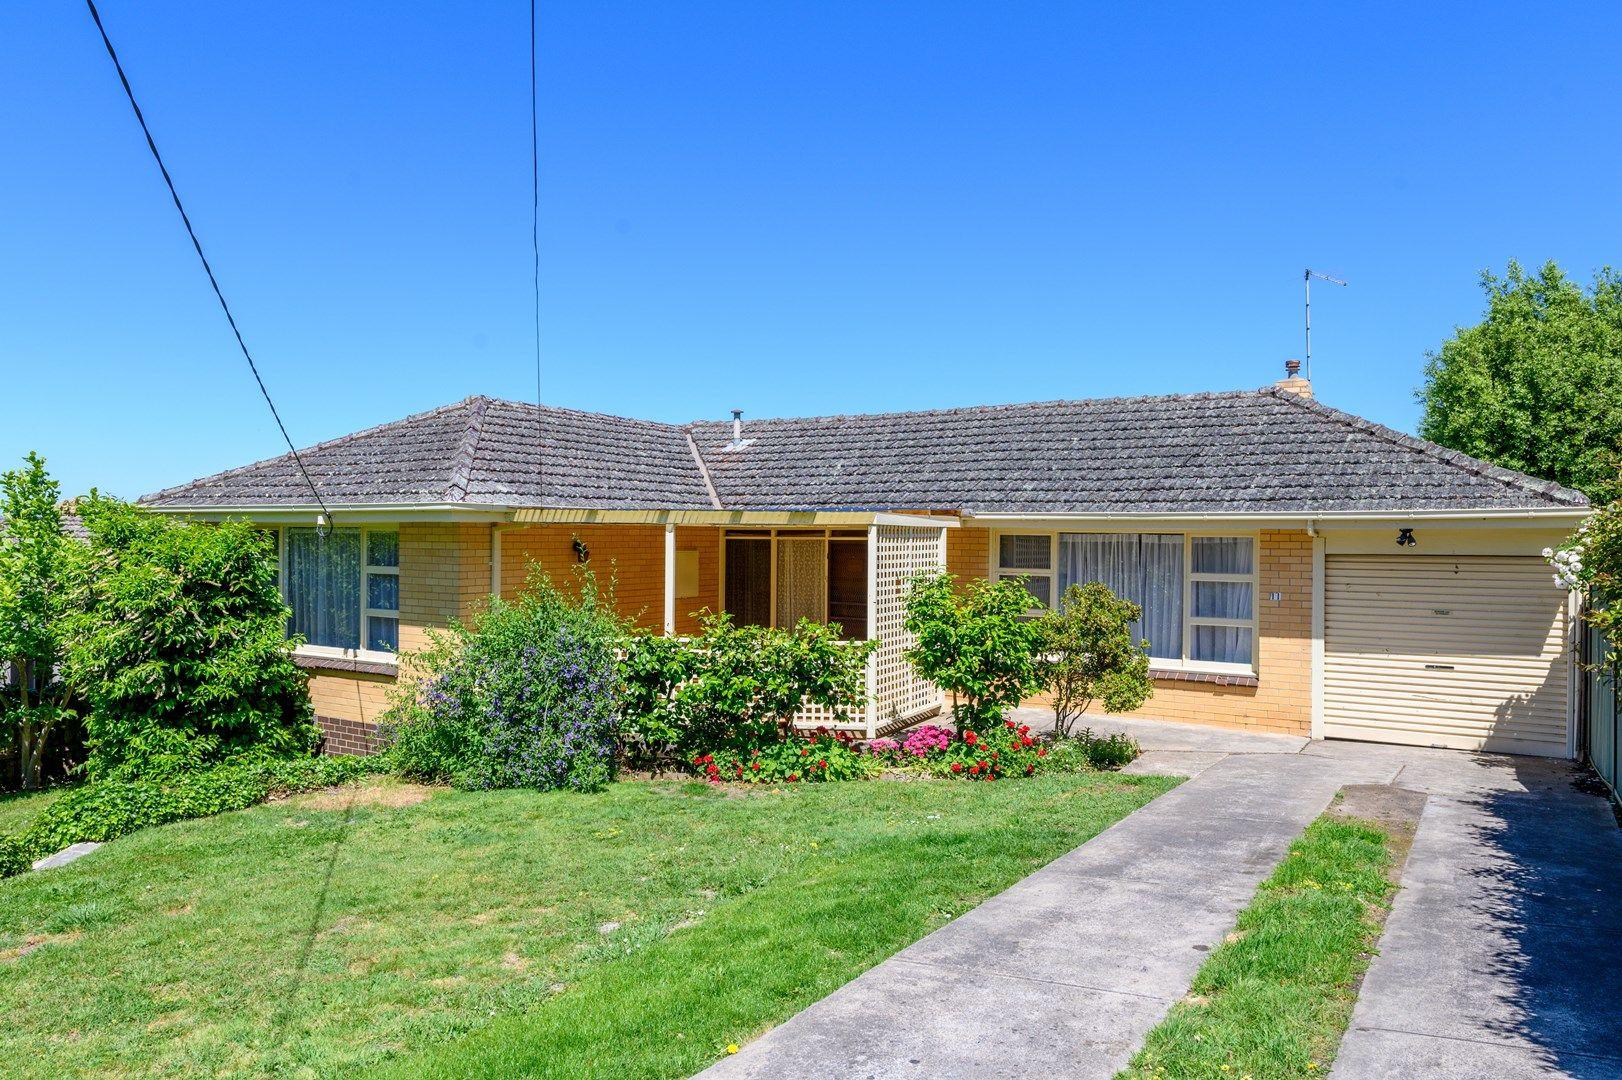 11 Hillside Drive, Ballarat North VIC 3350, Image 0